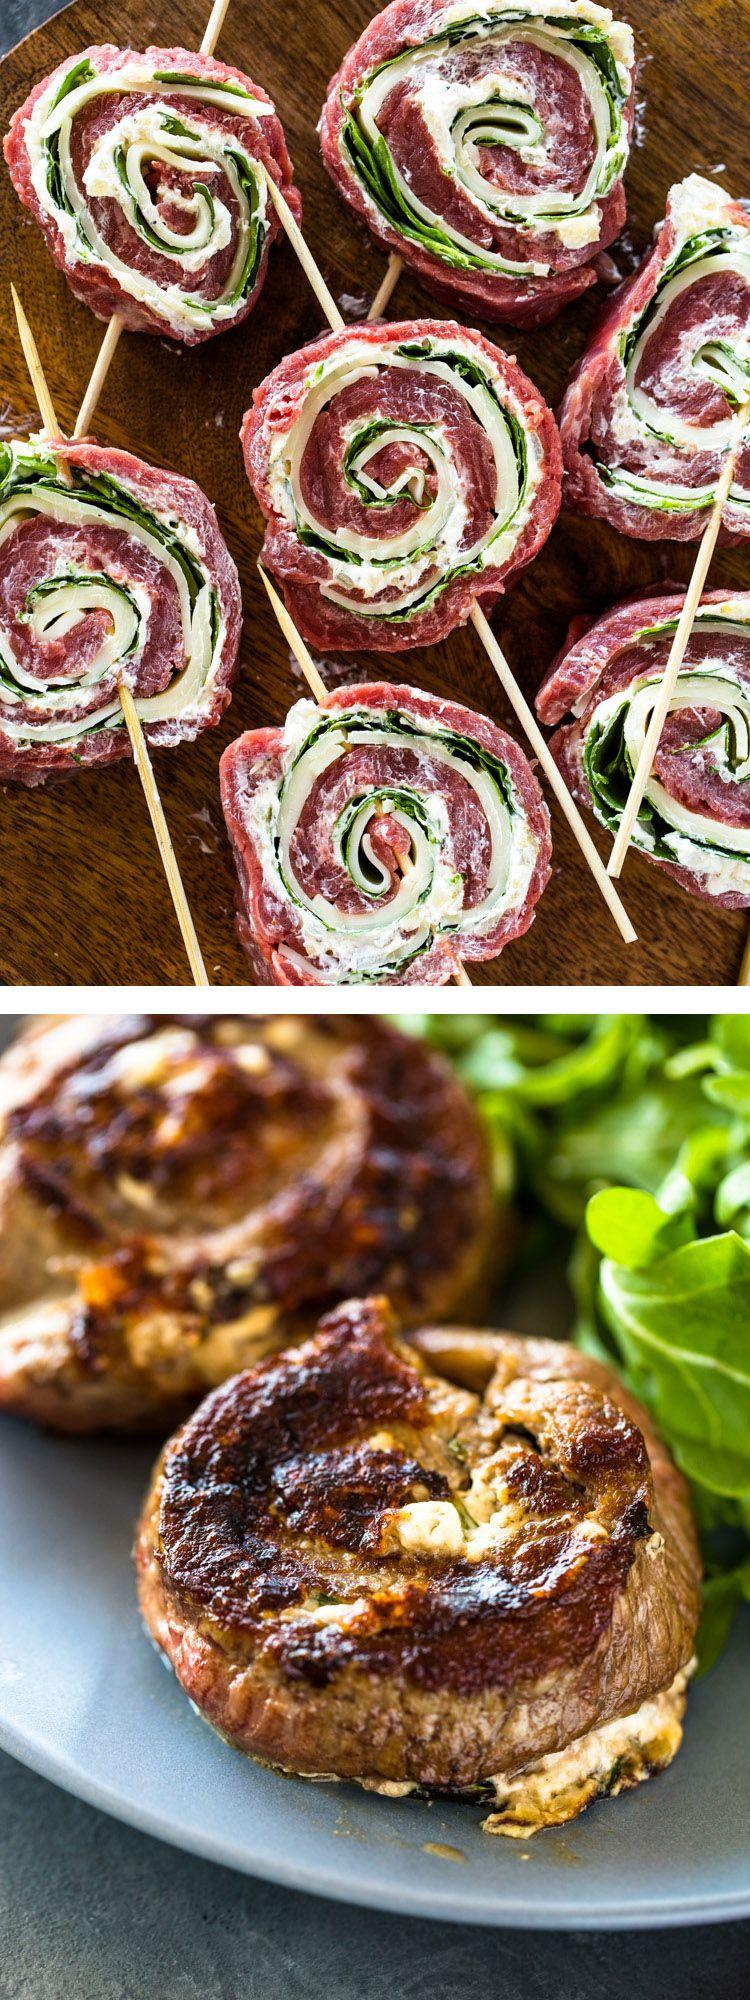 Spinach Cheese Stuffed Flank Steak Rolls | Gimme Delicious #recipesforflanksteak